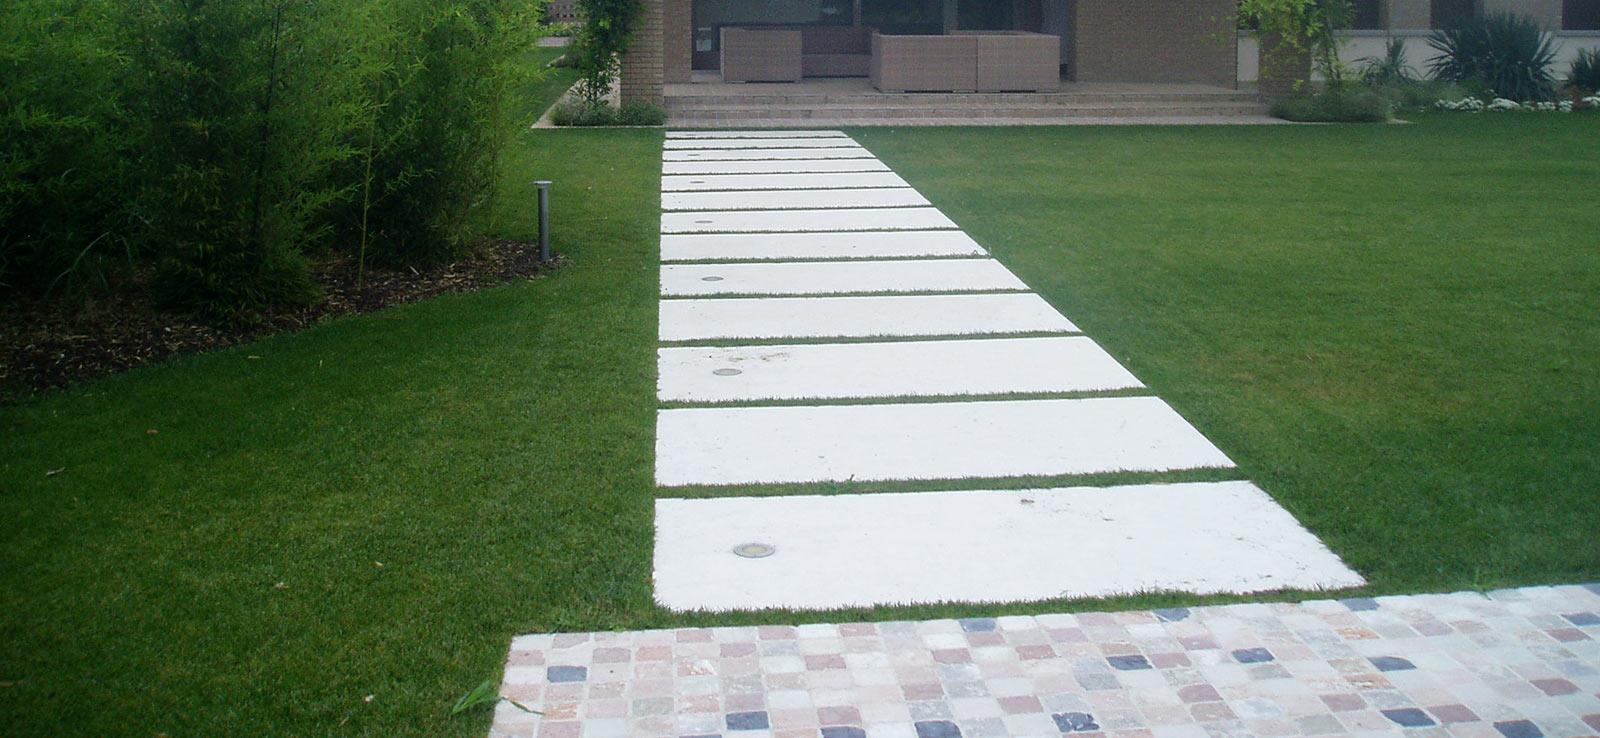 Pavimentazione esterna a doghe in pietra bianca domus - Pavimentazione esterna ...